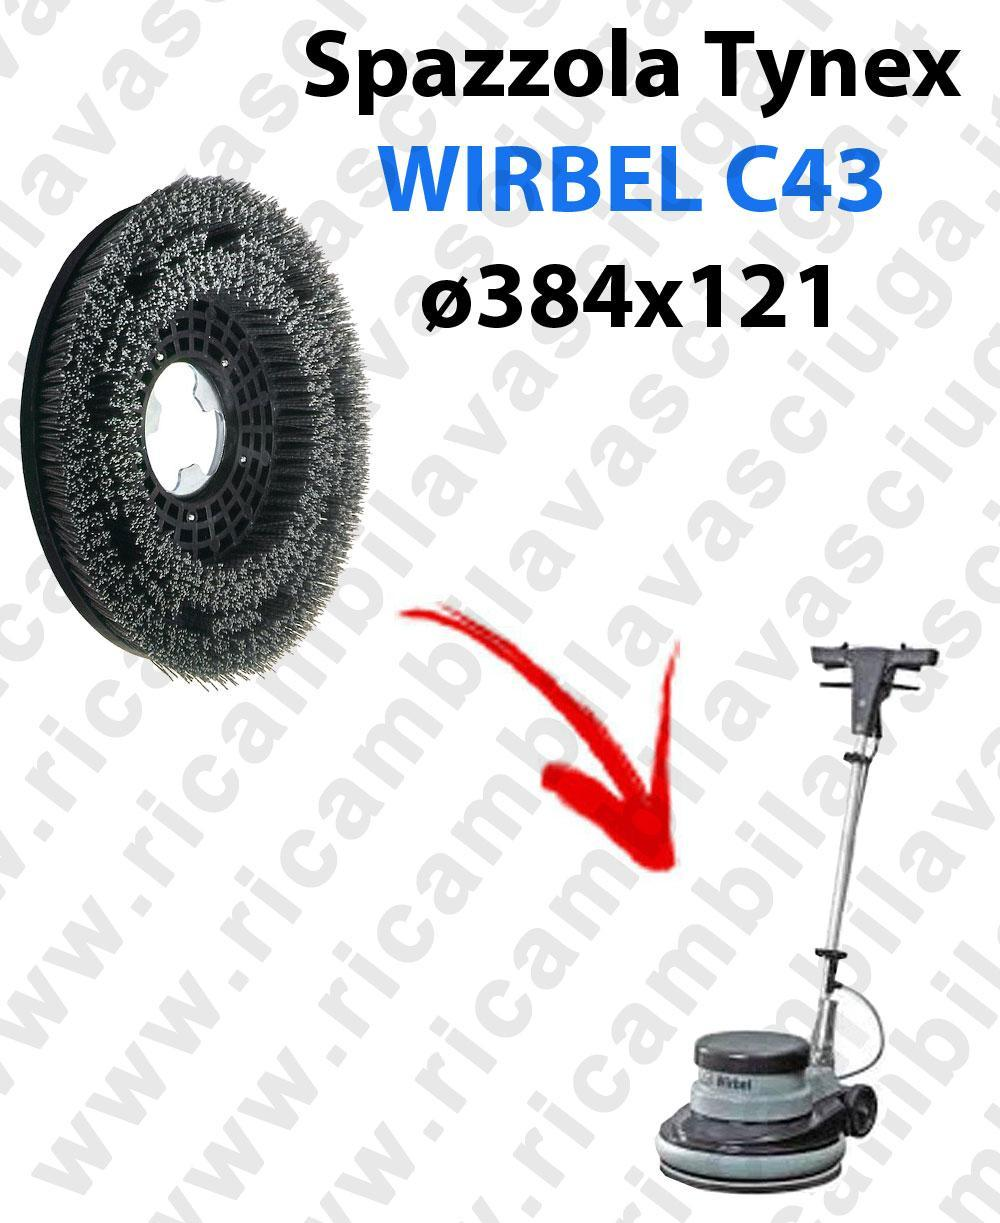 BROSSE TYNEX  pour mono BROSSE WIRBEL C43. Reference: tynex  diamétre 384 X 121